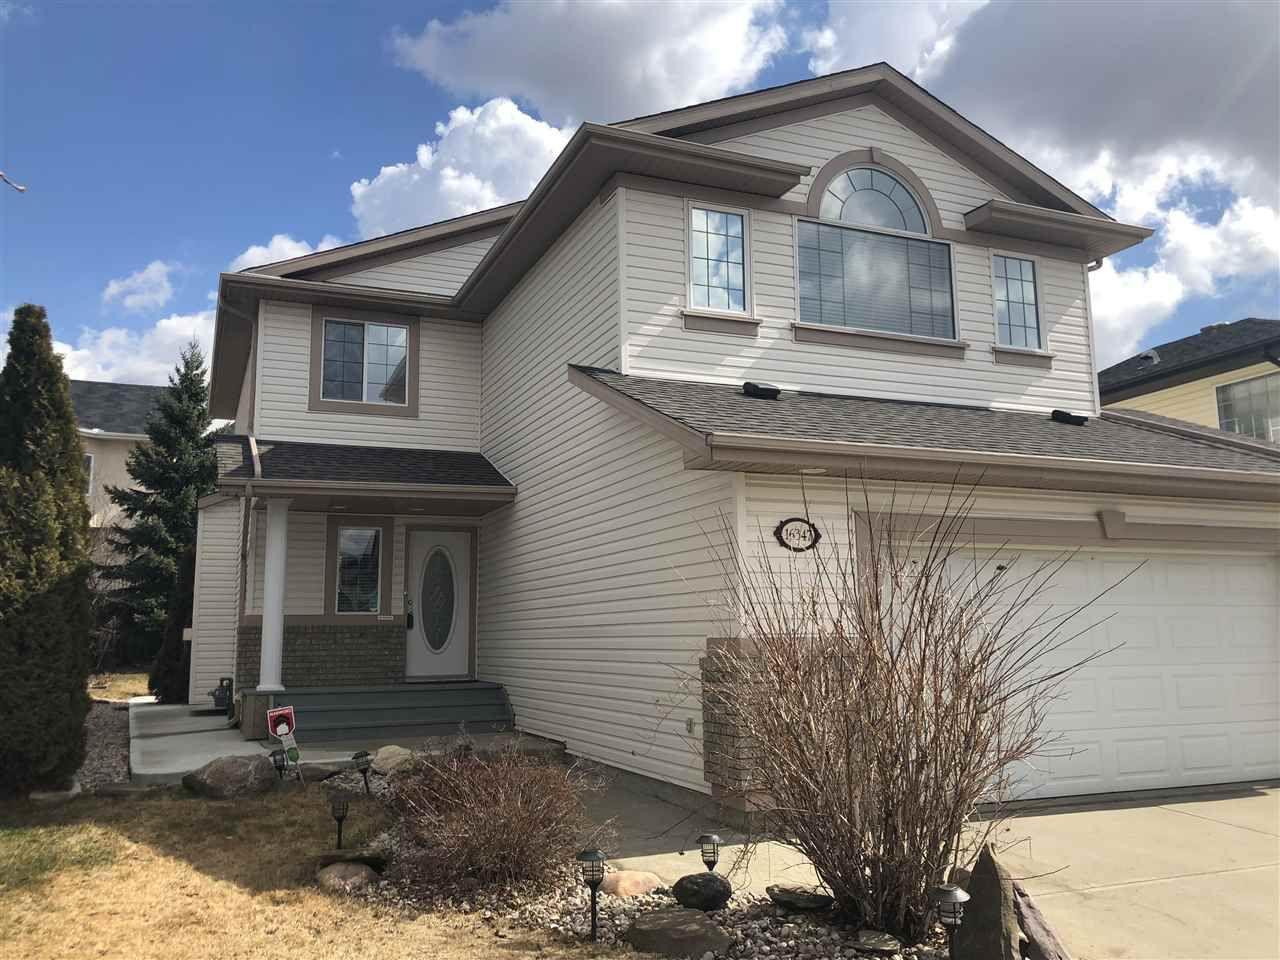 Main Photo: 16347 87 Street in Edmonton: Zone 28 House for sale : MLS®# E4145494